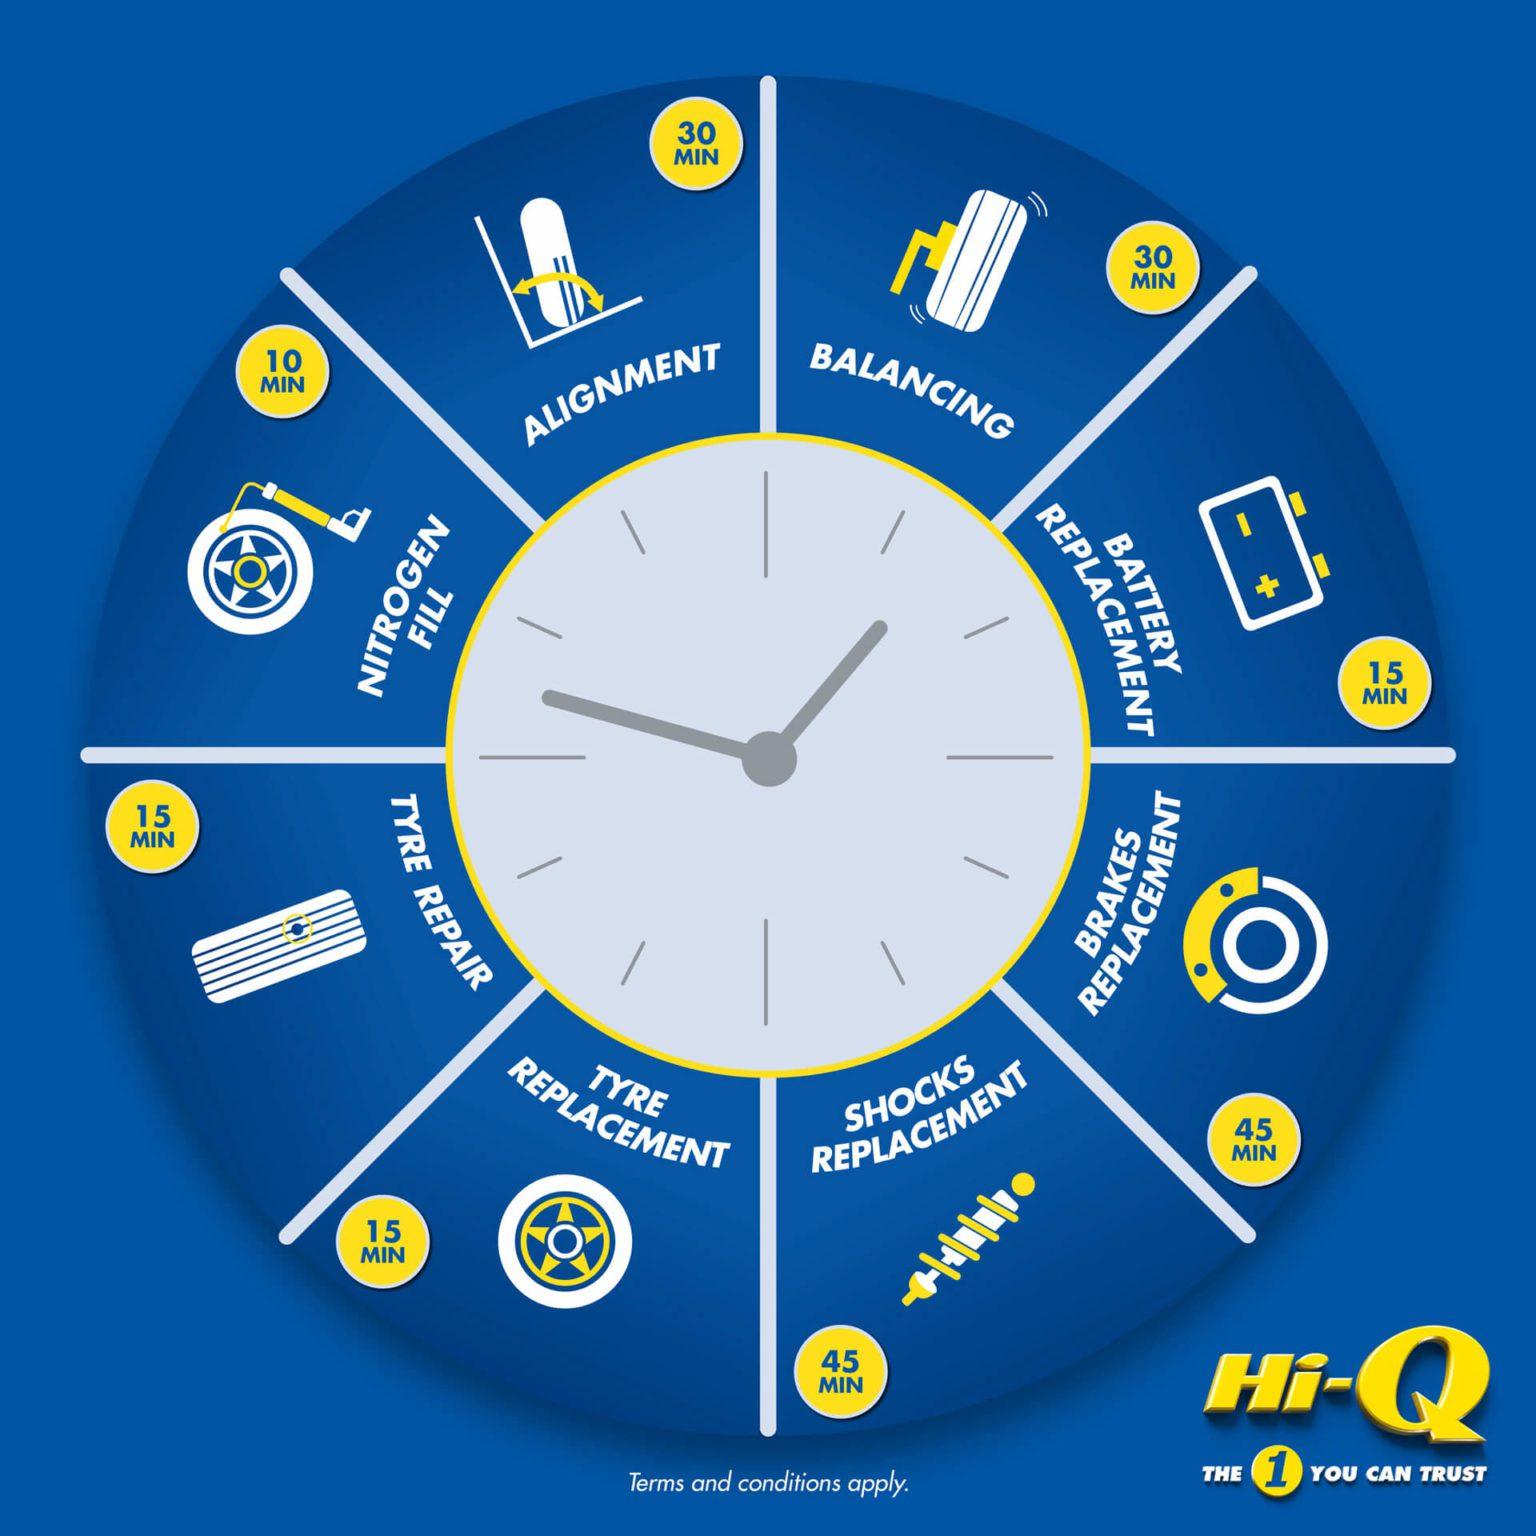 Hi-Q-Service-time-wheel-Original-FA-NO-HEADING (1)